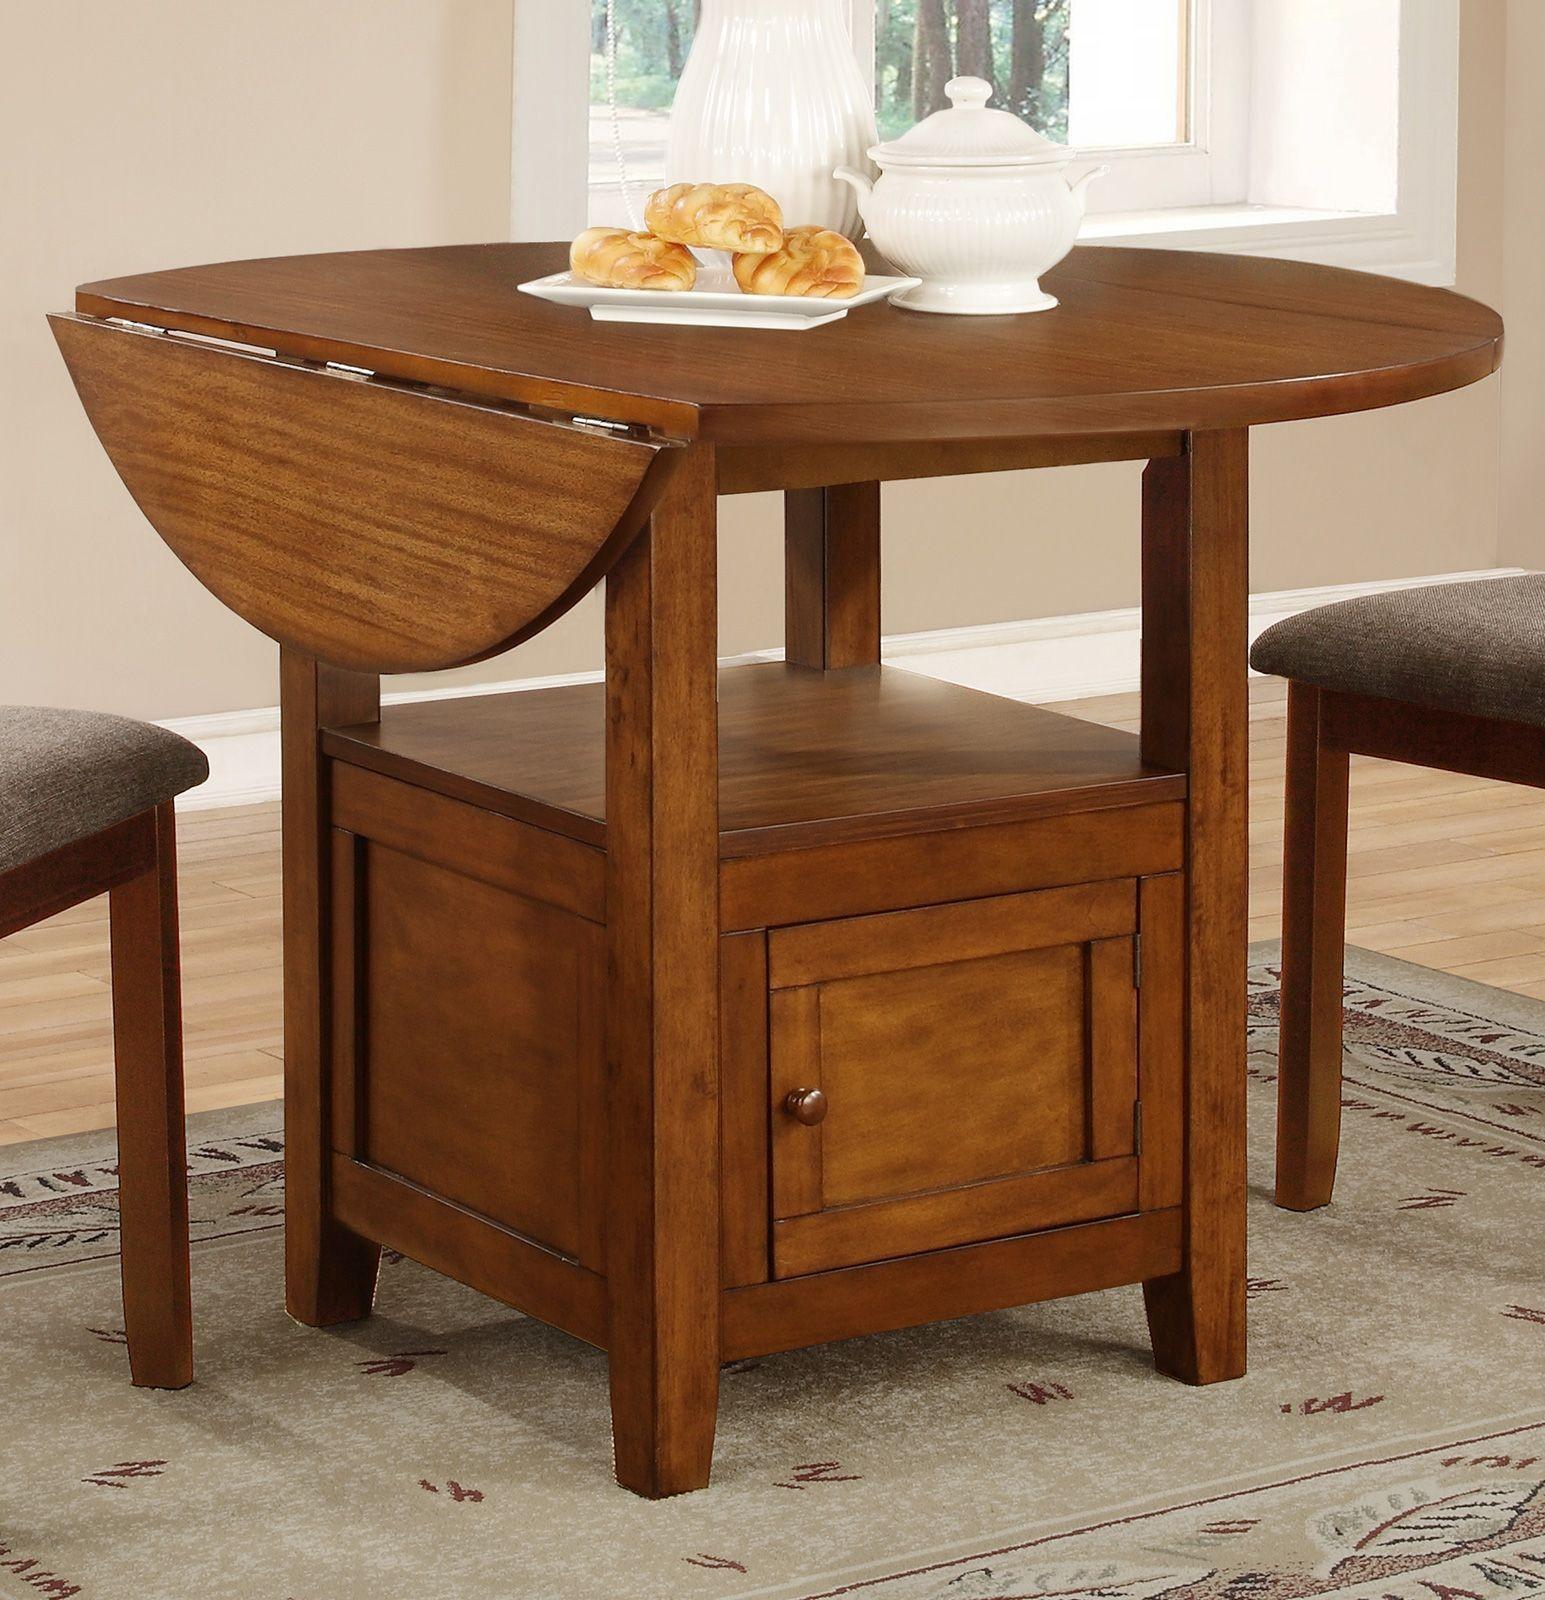 Stockton warm brown drop leaf round dining table 105401 for Round drop leaf dining table